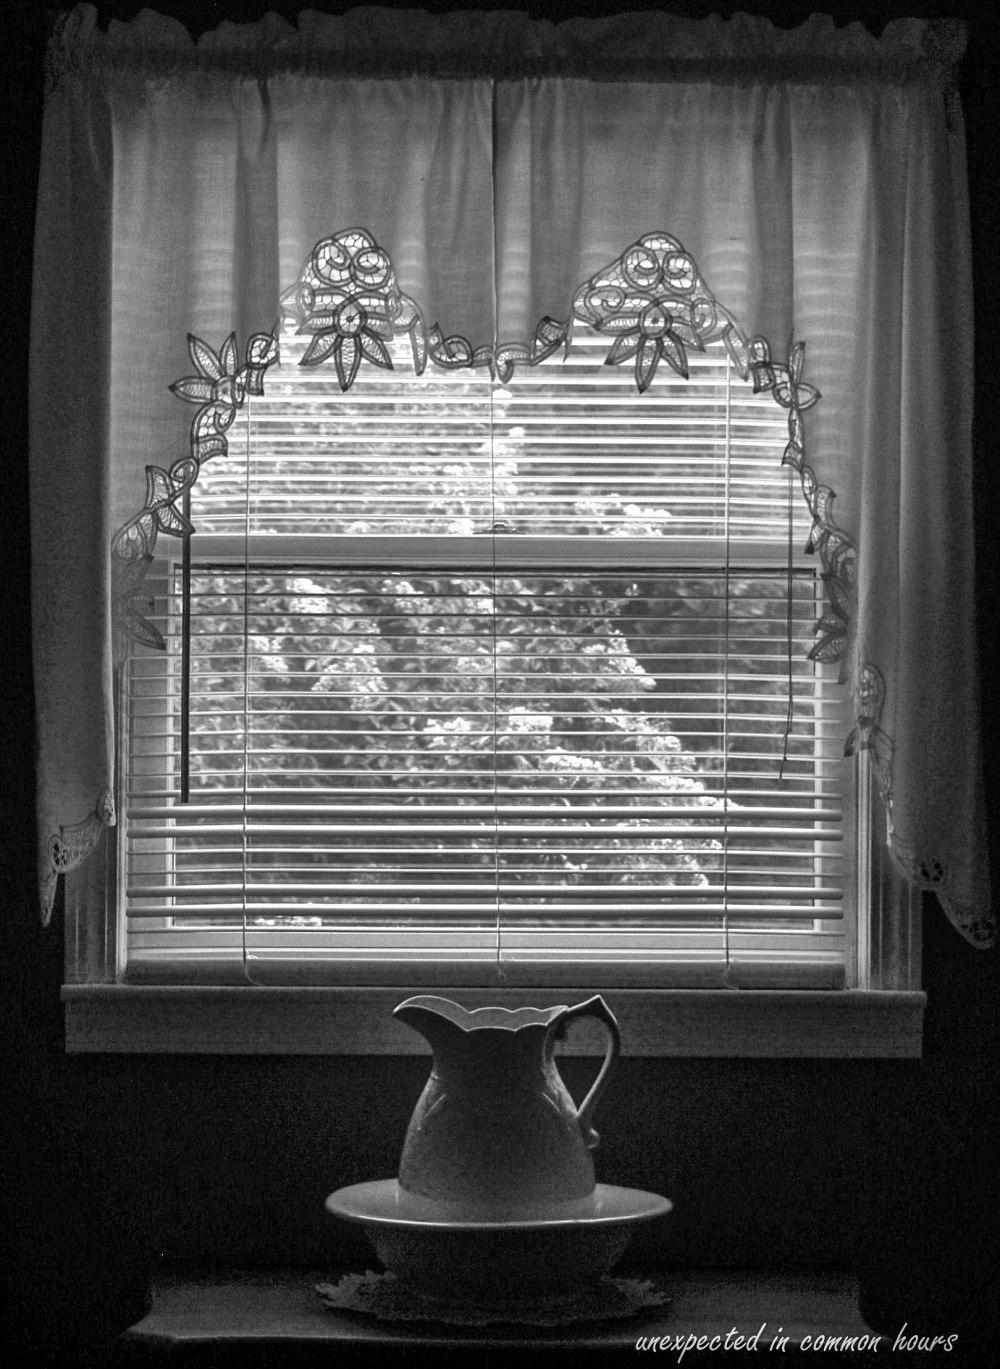 Crape myrtle through the upstairs window